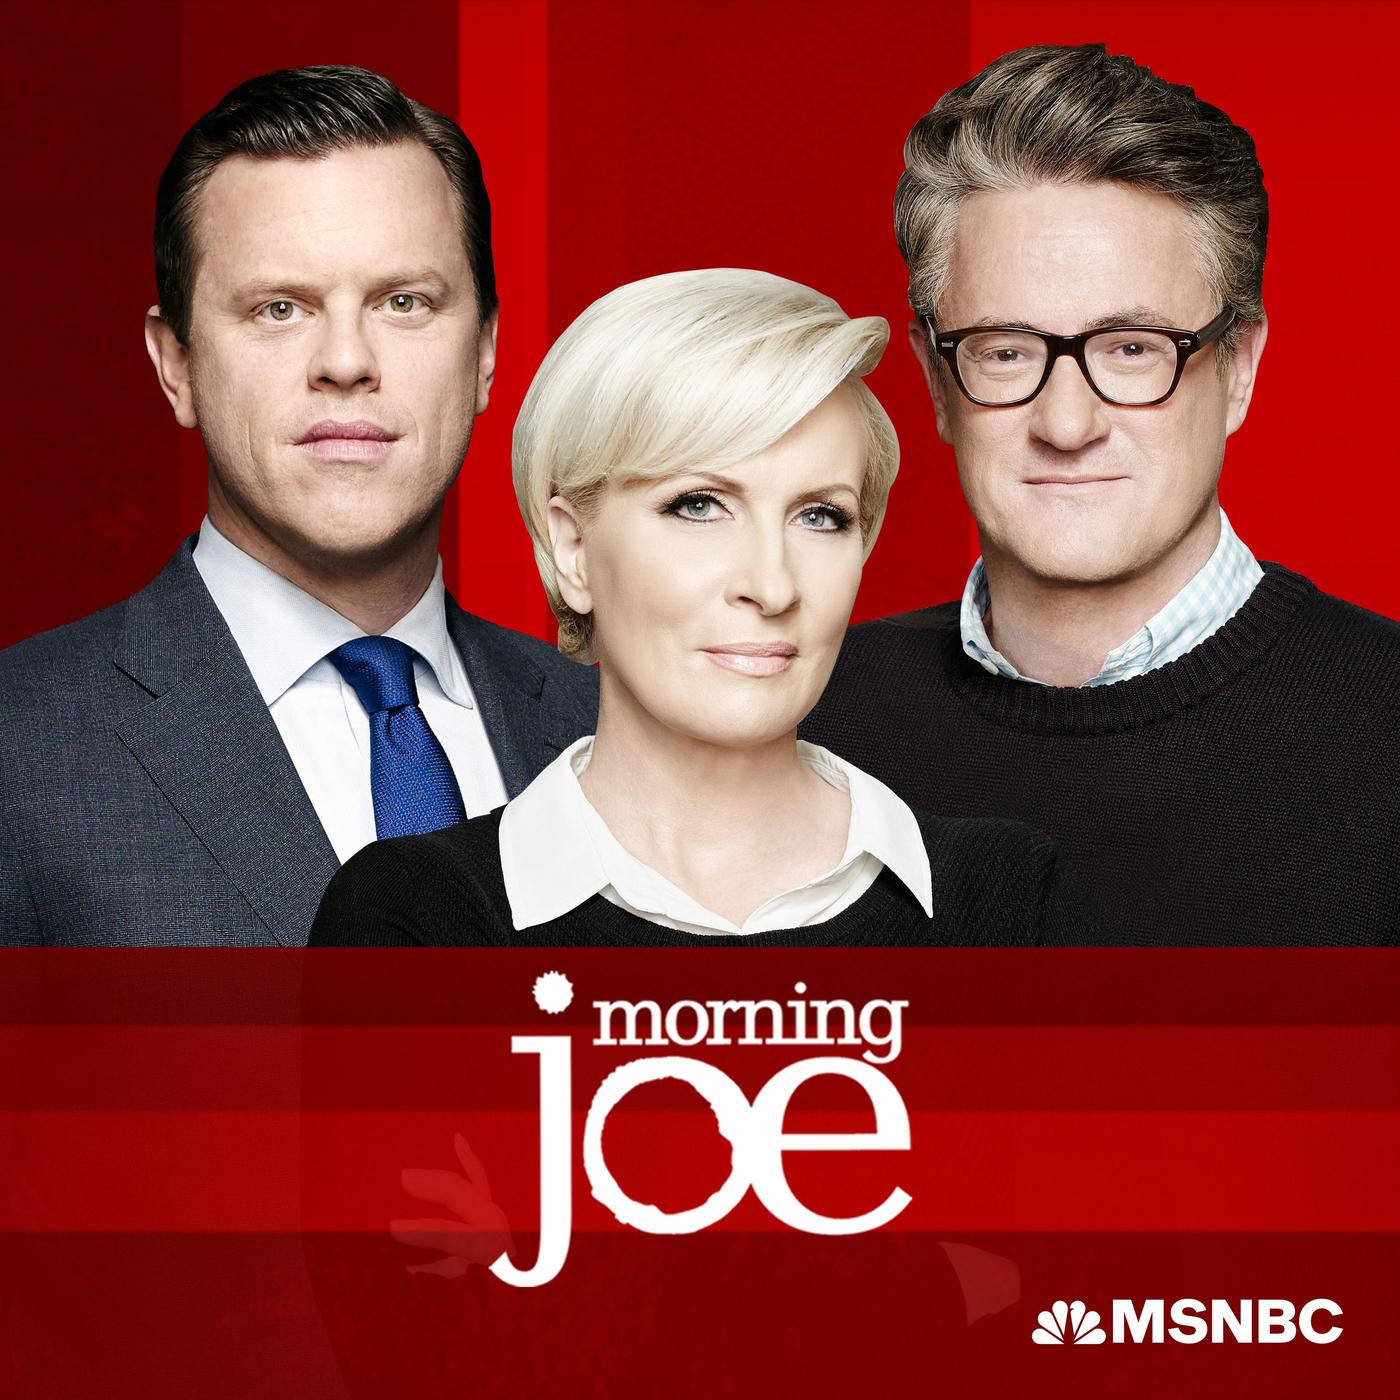 Joe Scarborough and Mika Brzezinski, MSNBC